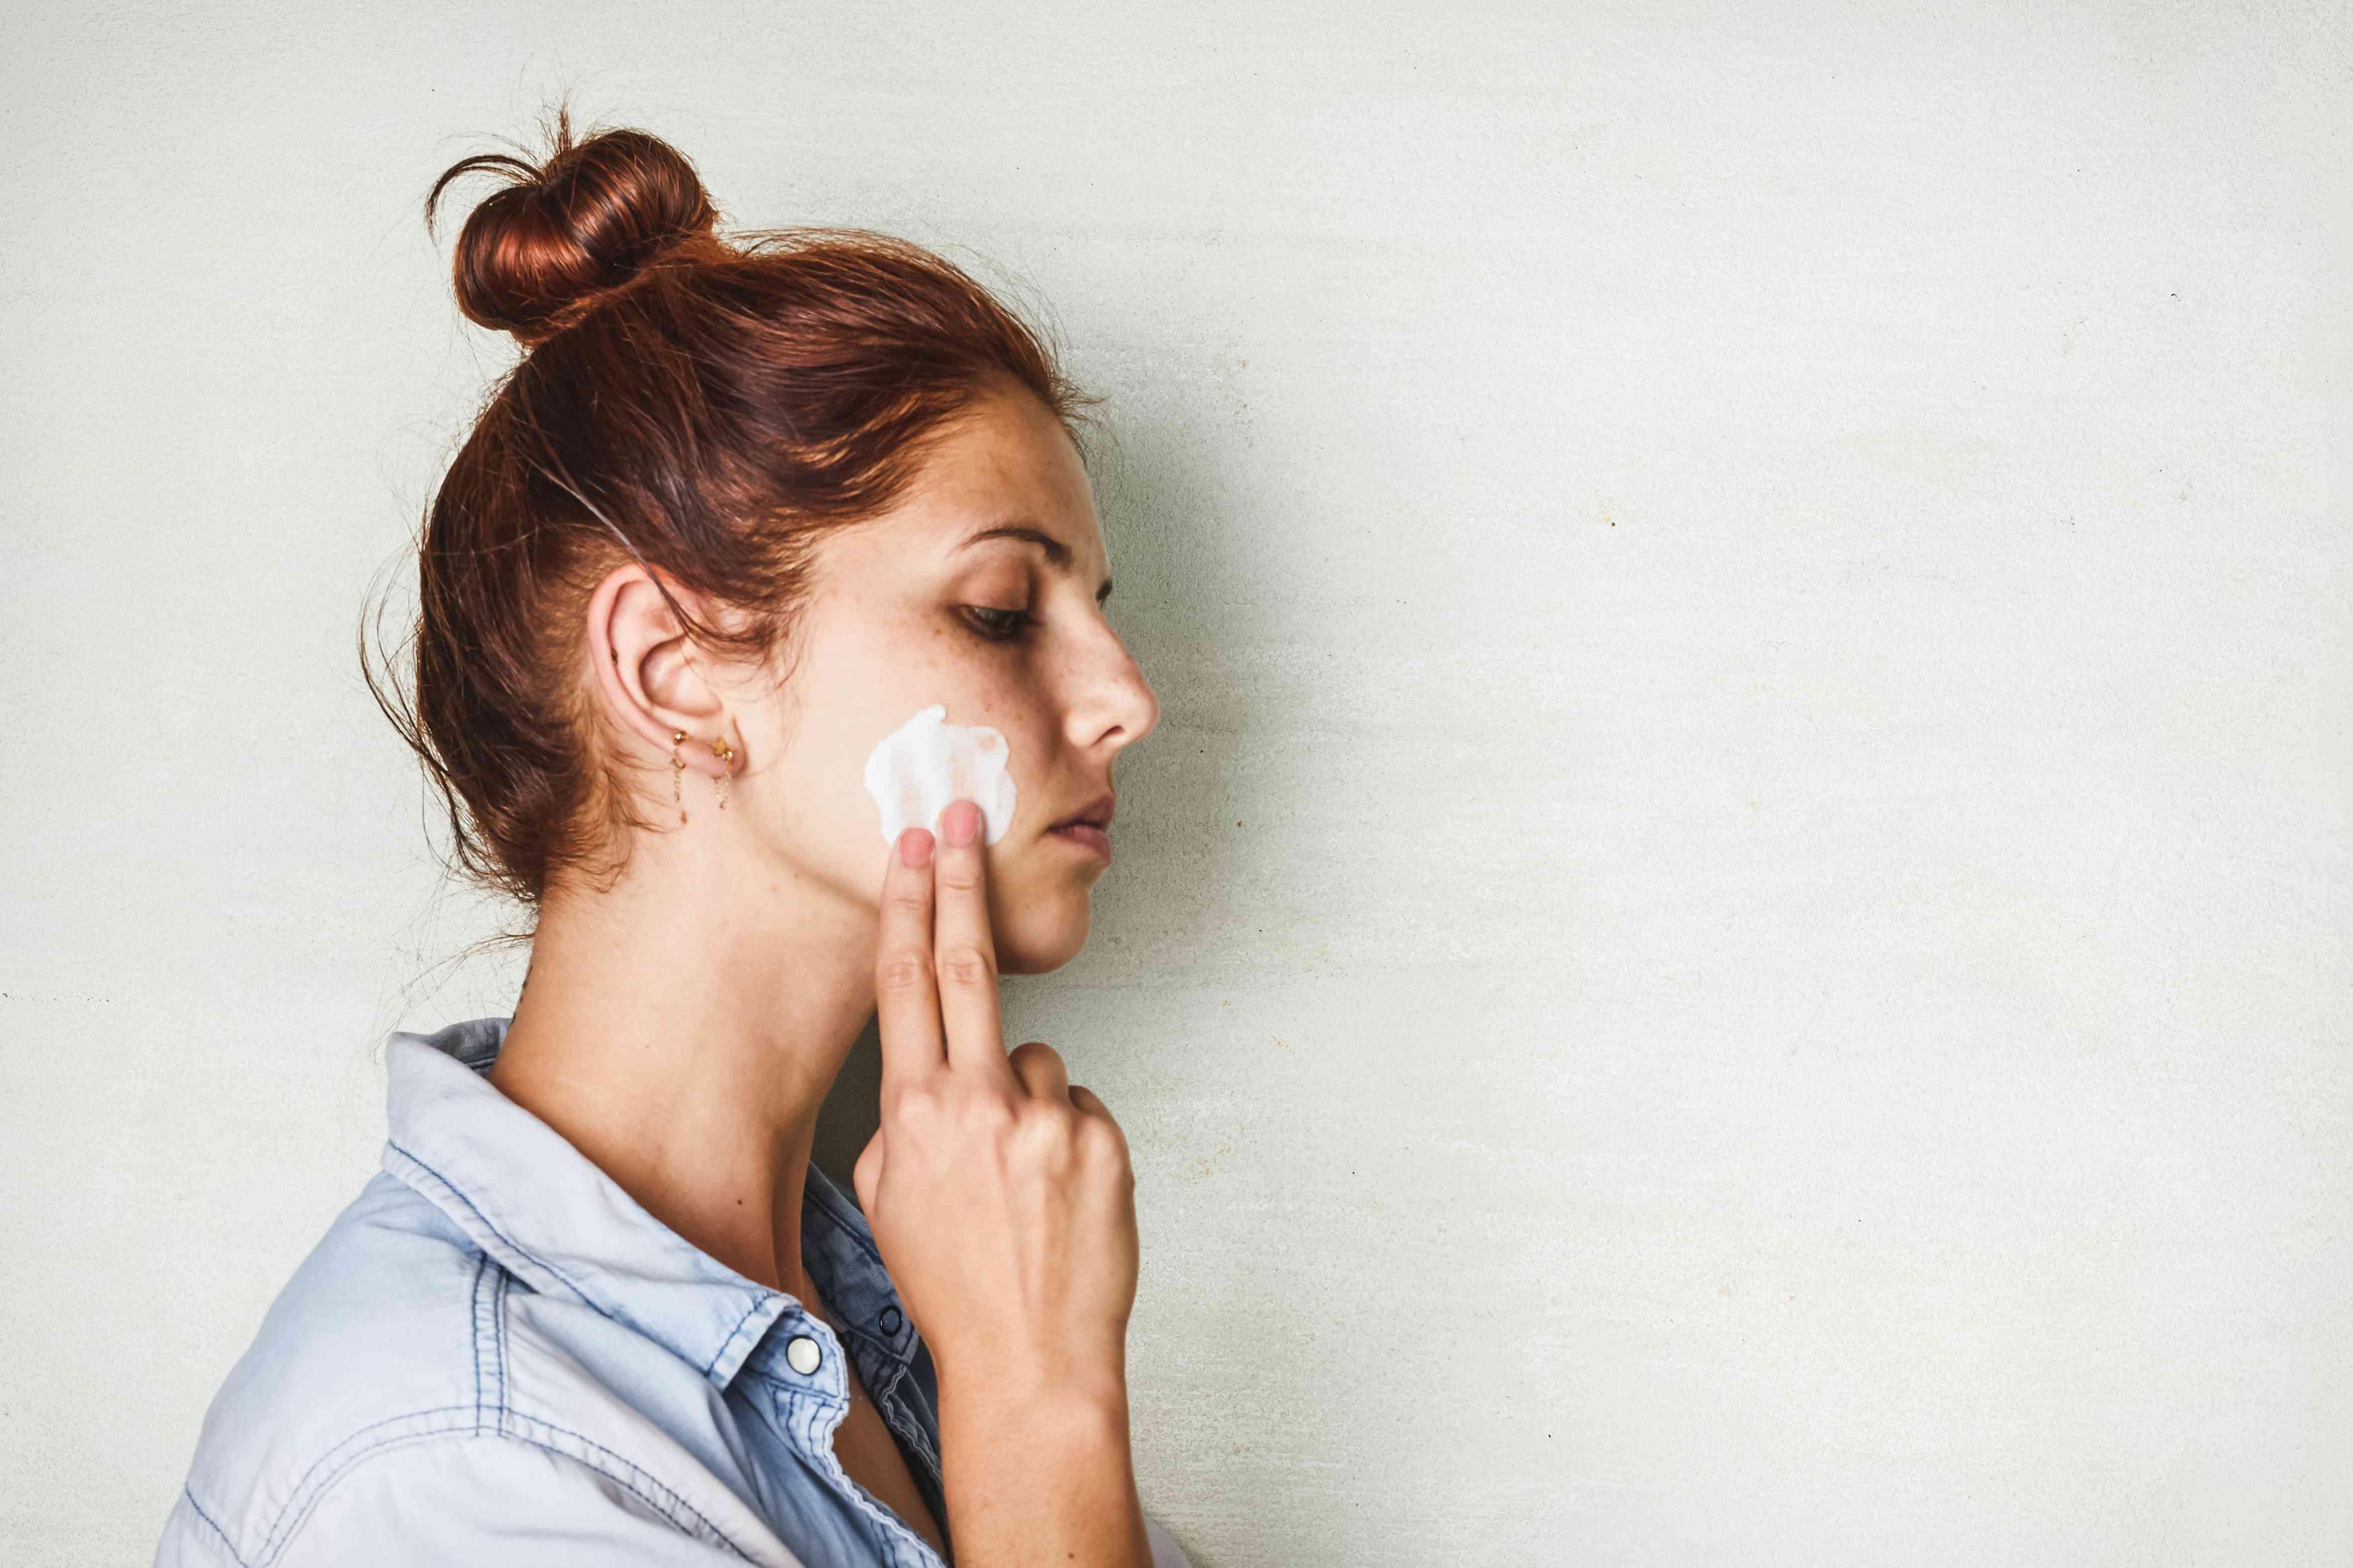 woman with top bun rubs plain Greek yogurt on her face to clean skin